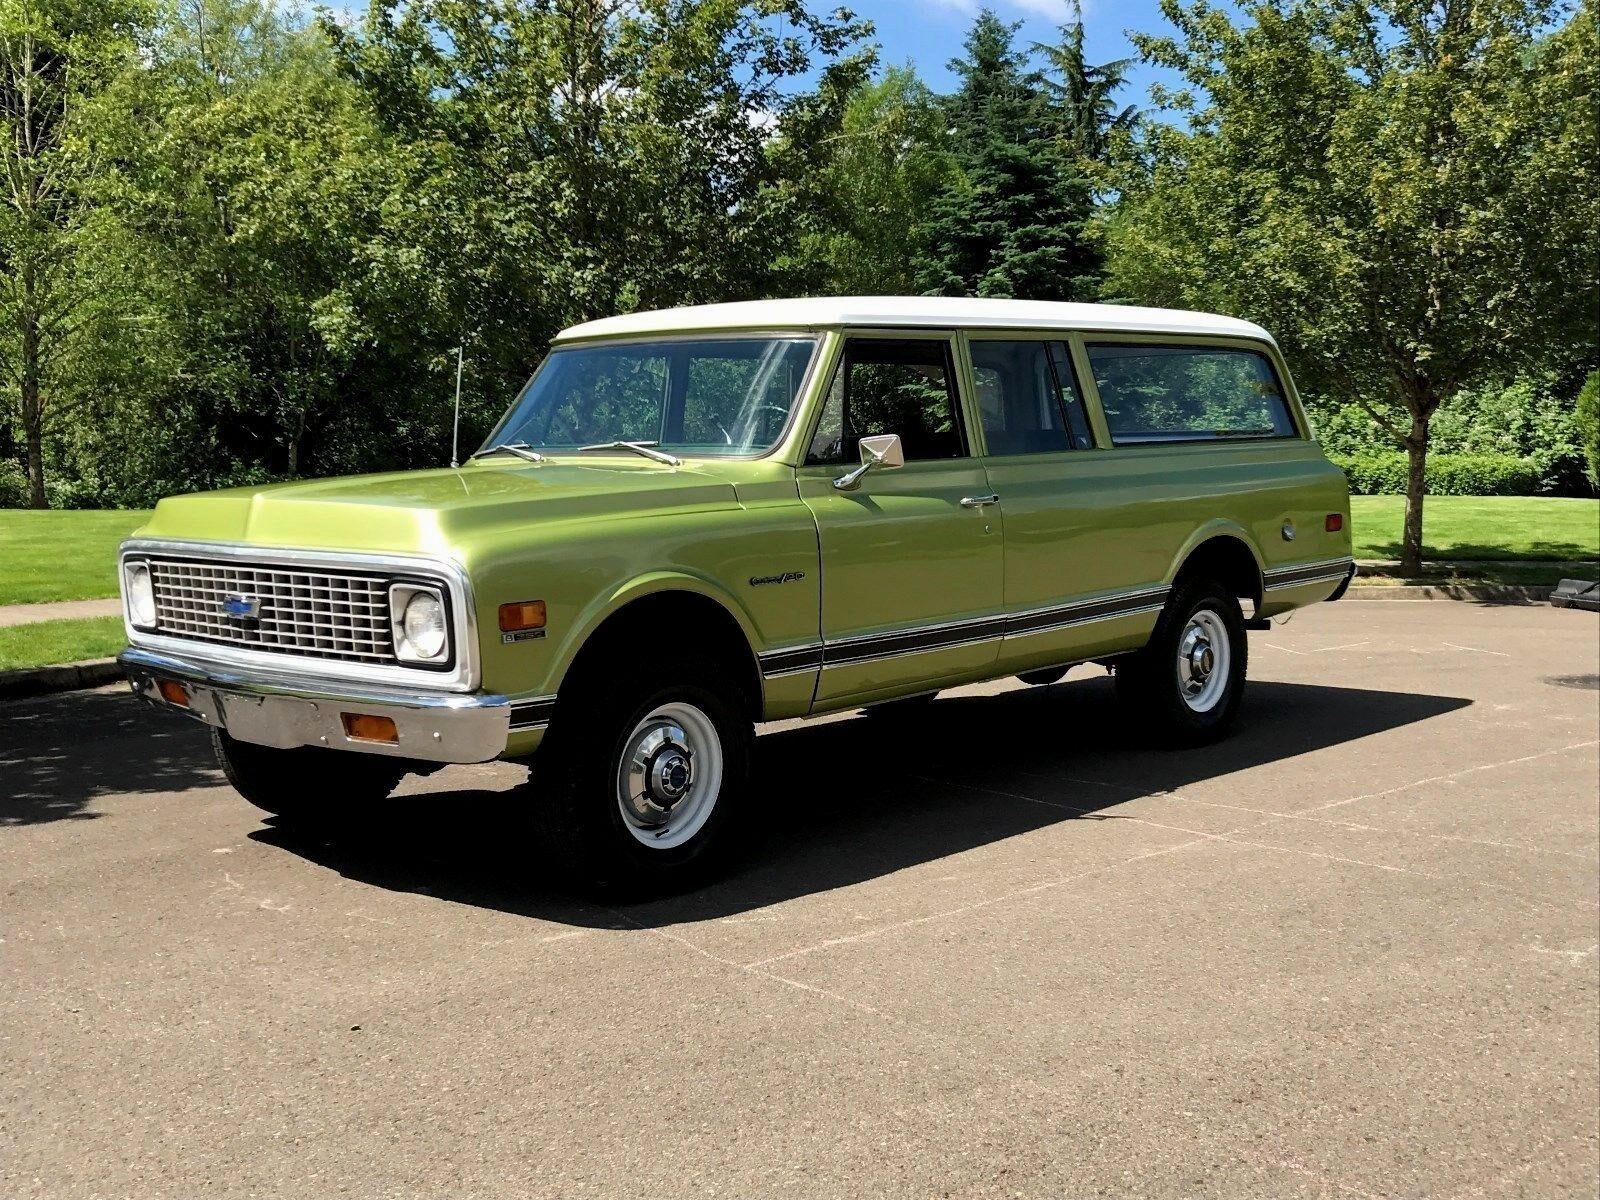 1972 Chevrolet Suburban Custom DLX 1972 Chevy Suburban 2500 4x4 3dr V8 350 Eng' Auto 130k Miles 1-Owner Rust Free